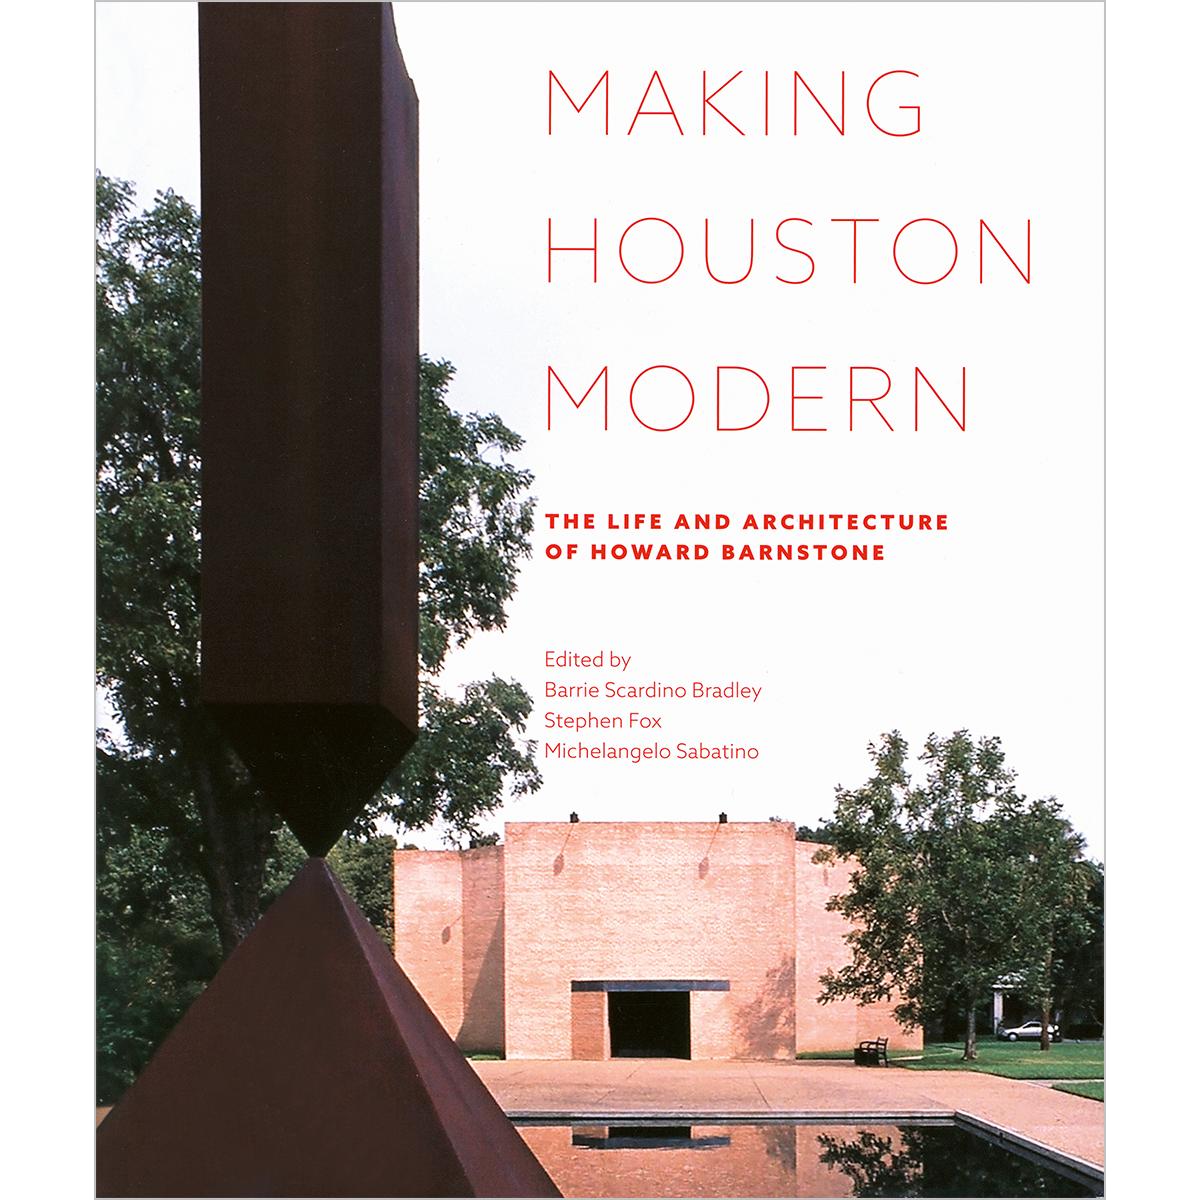 Making Houston Modern